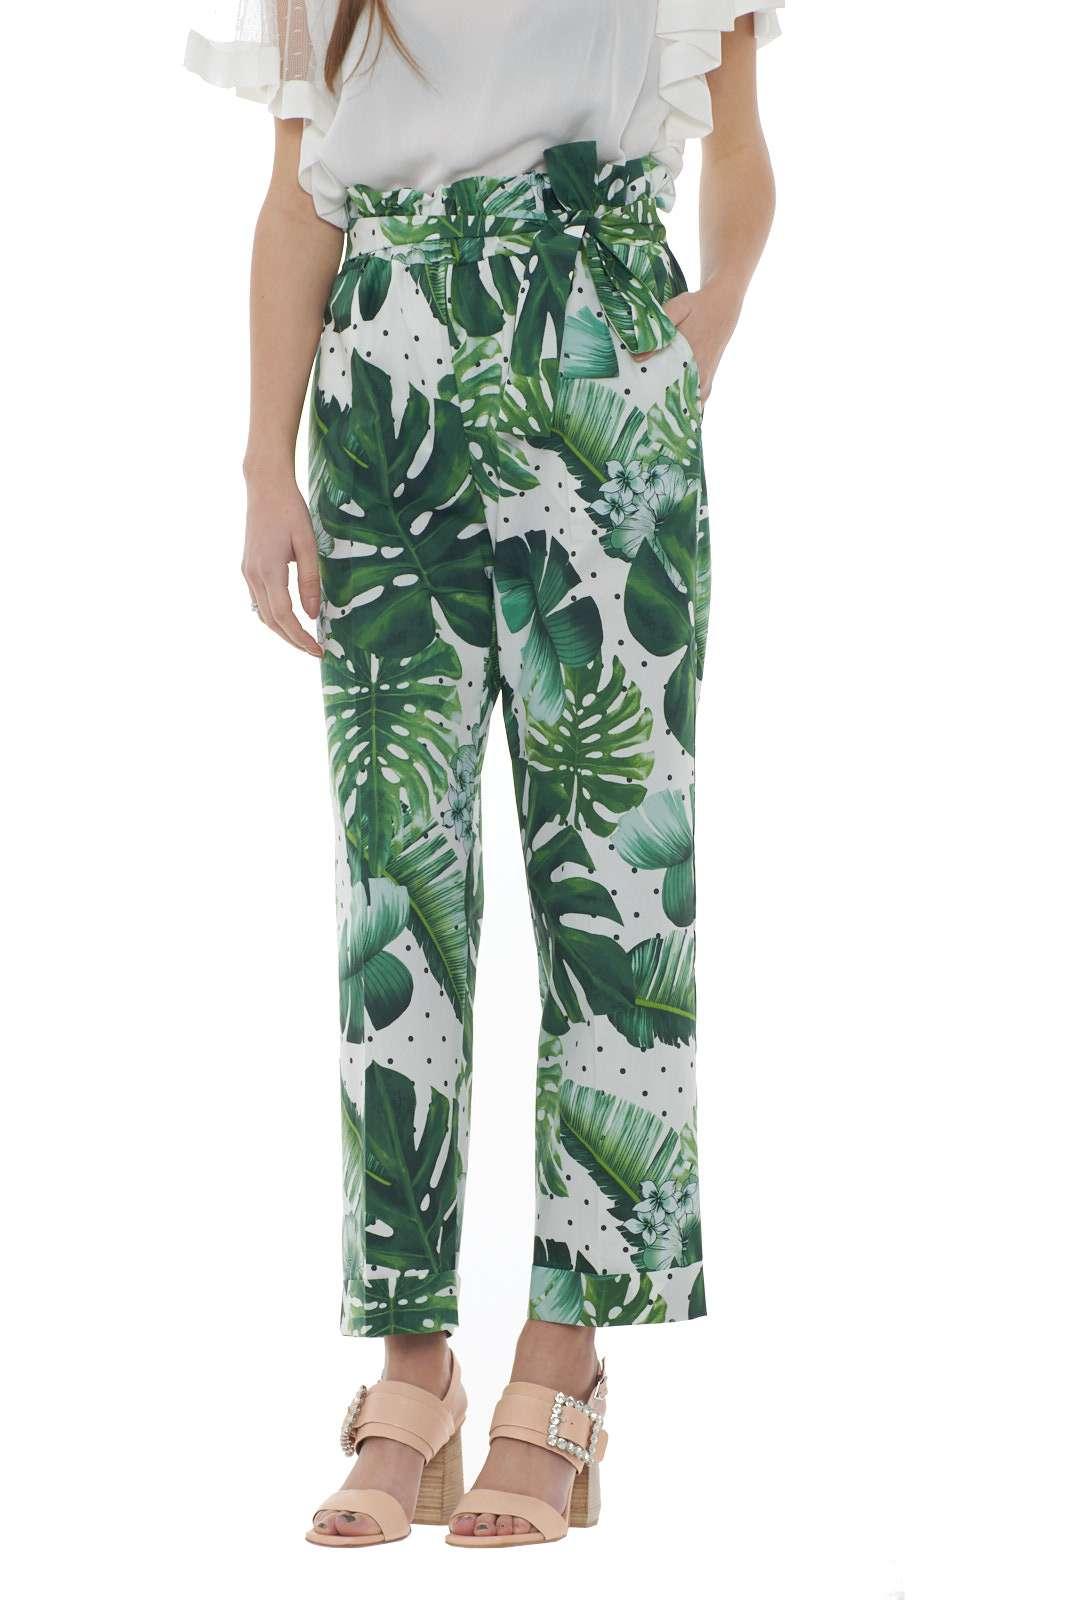 https://www.parmax.com/media/catalog/product/a/i/PE-outlet_parmax-pantaloni-donna-TwinSet-201TP2553-A.jpg